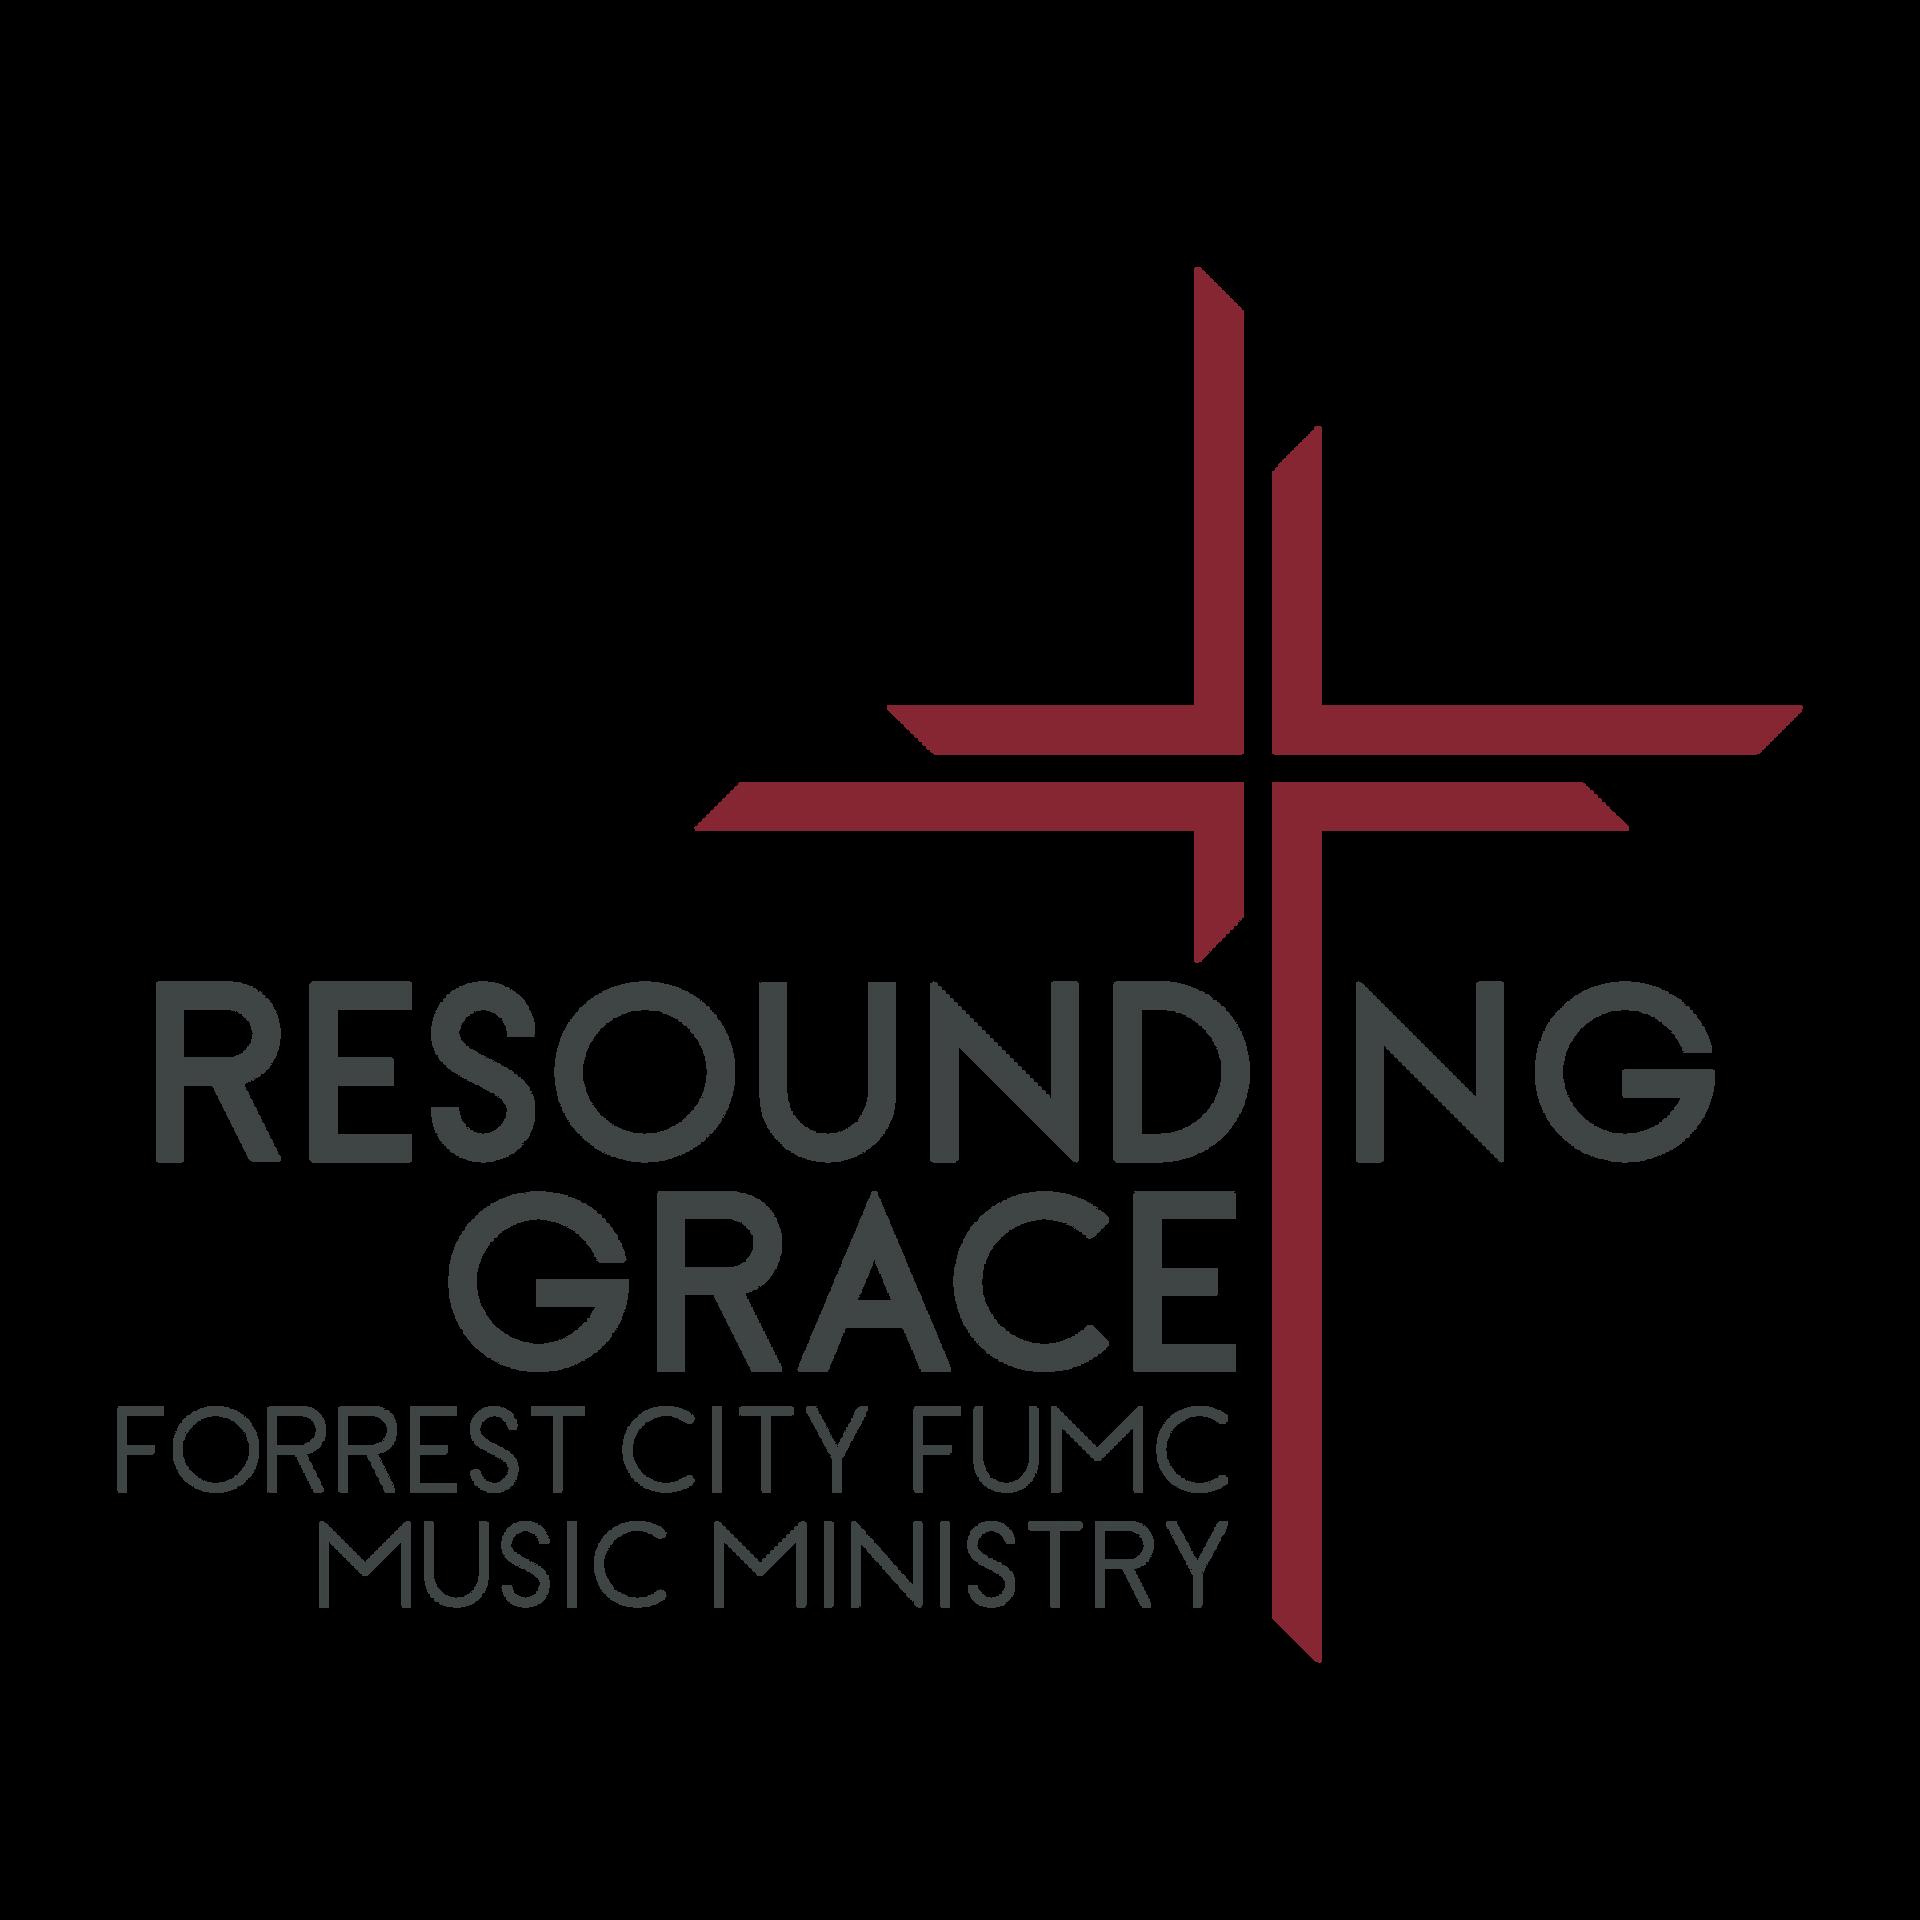 Resouding Grace